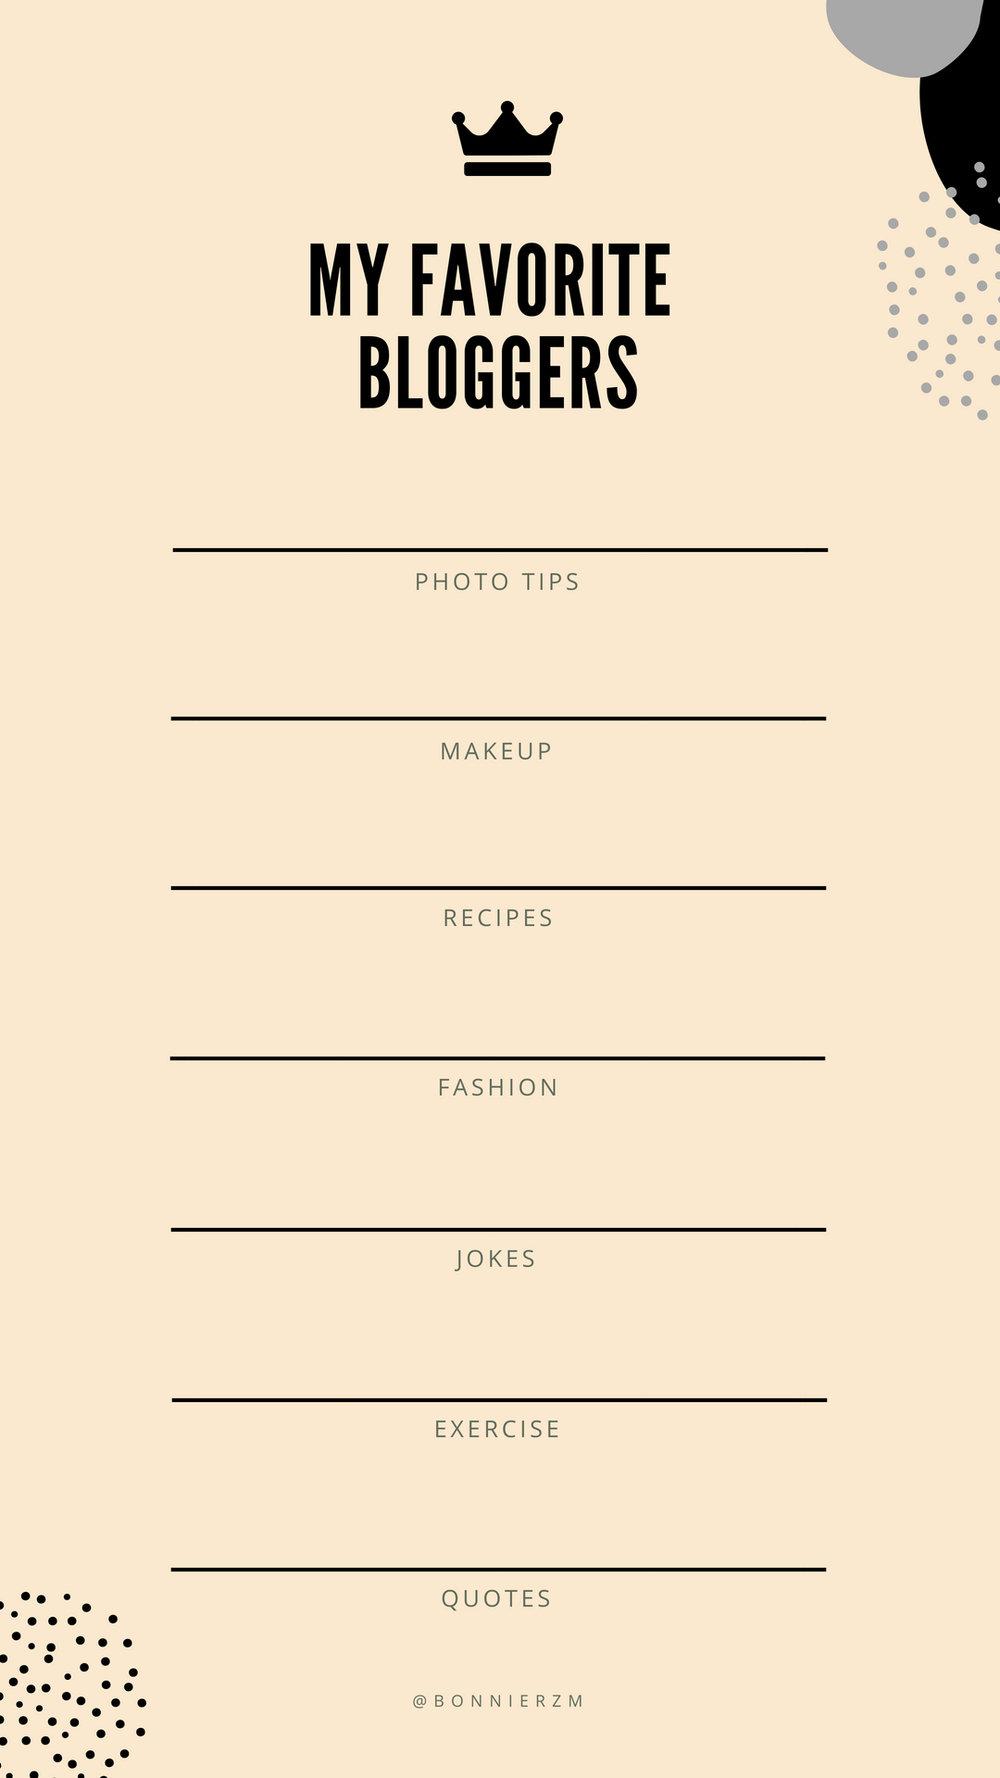 My favorite bloggers.jpg